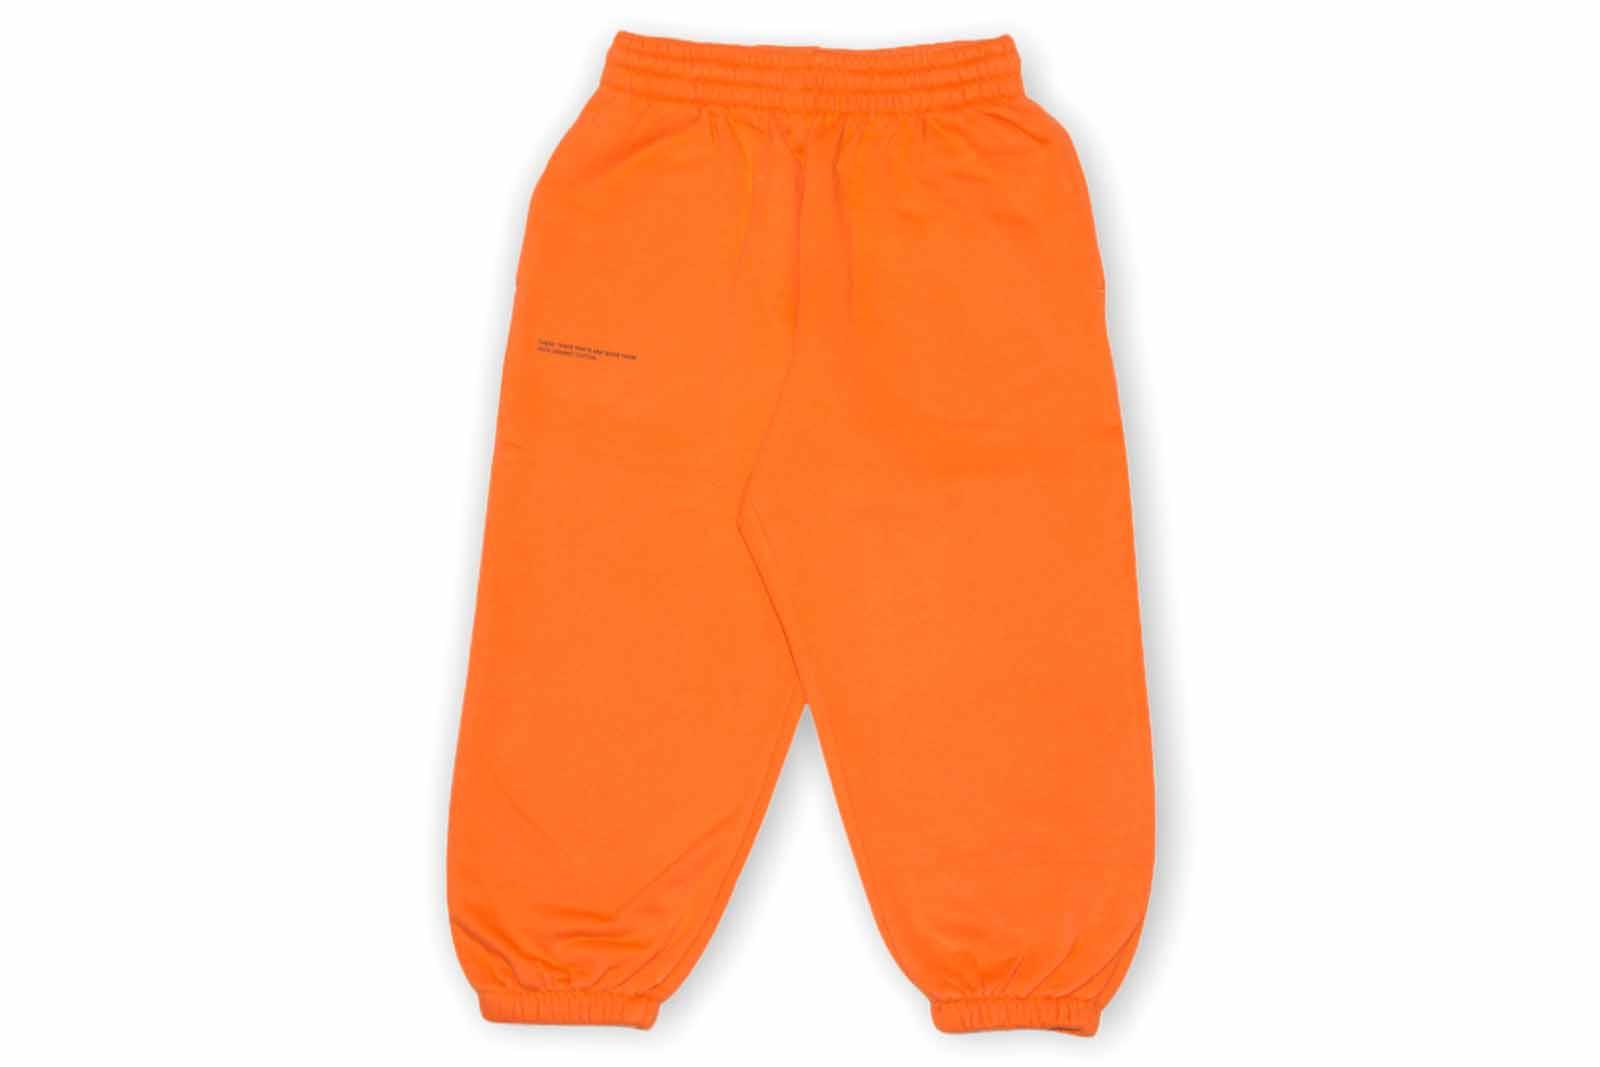 slide 1 - Persimmon Orange Organic Cotton Track Pants